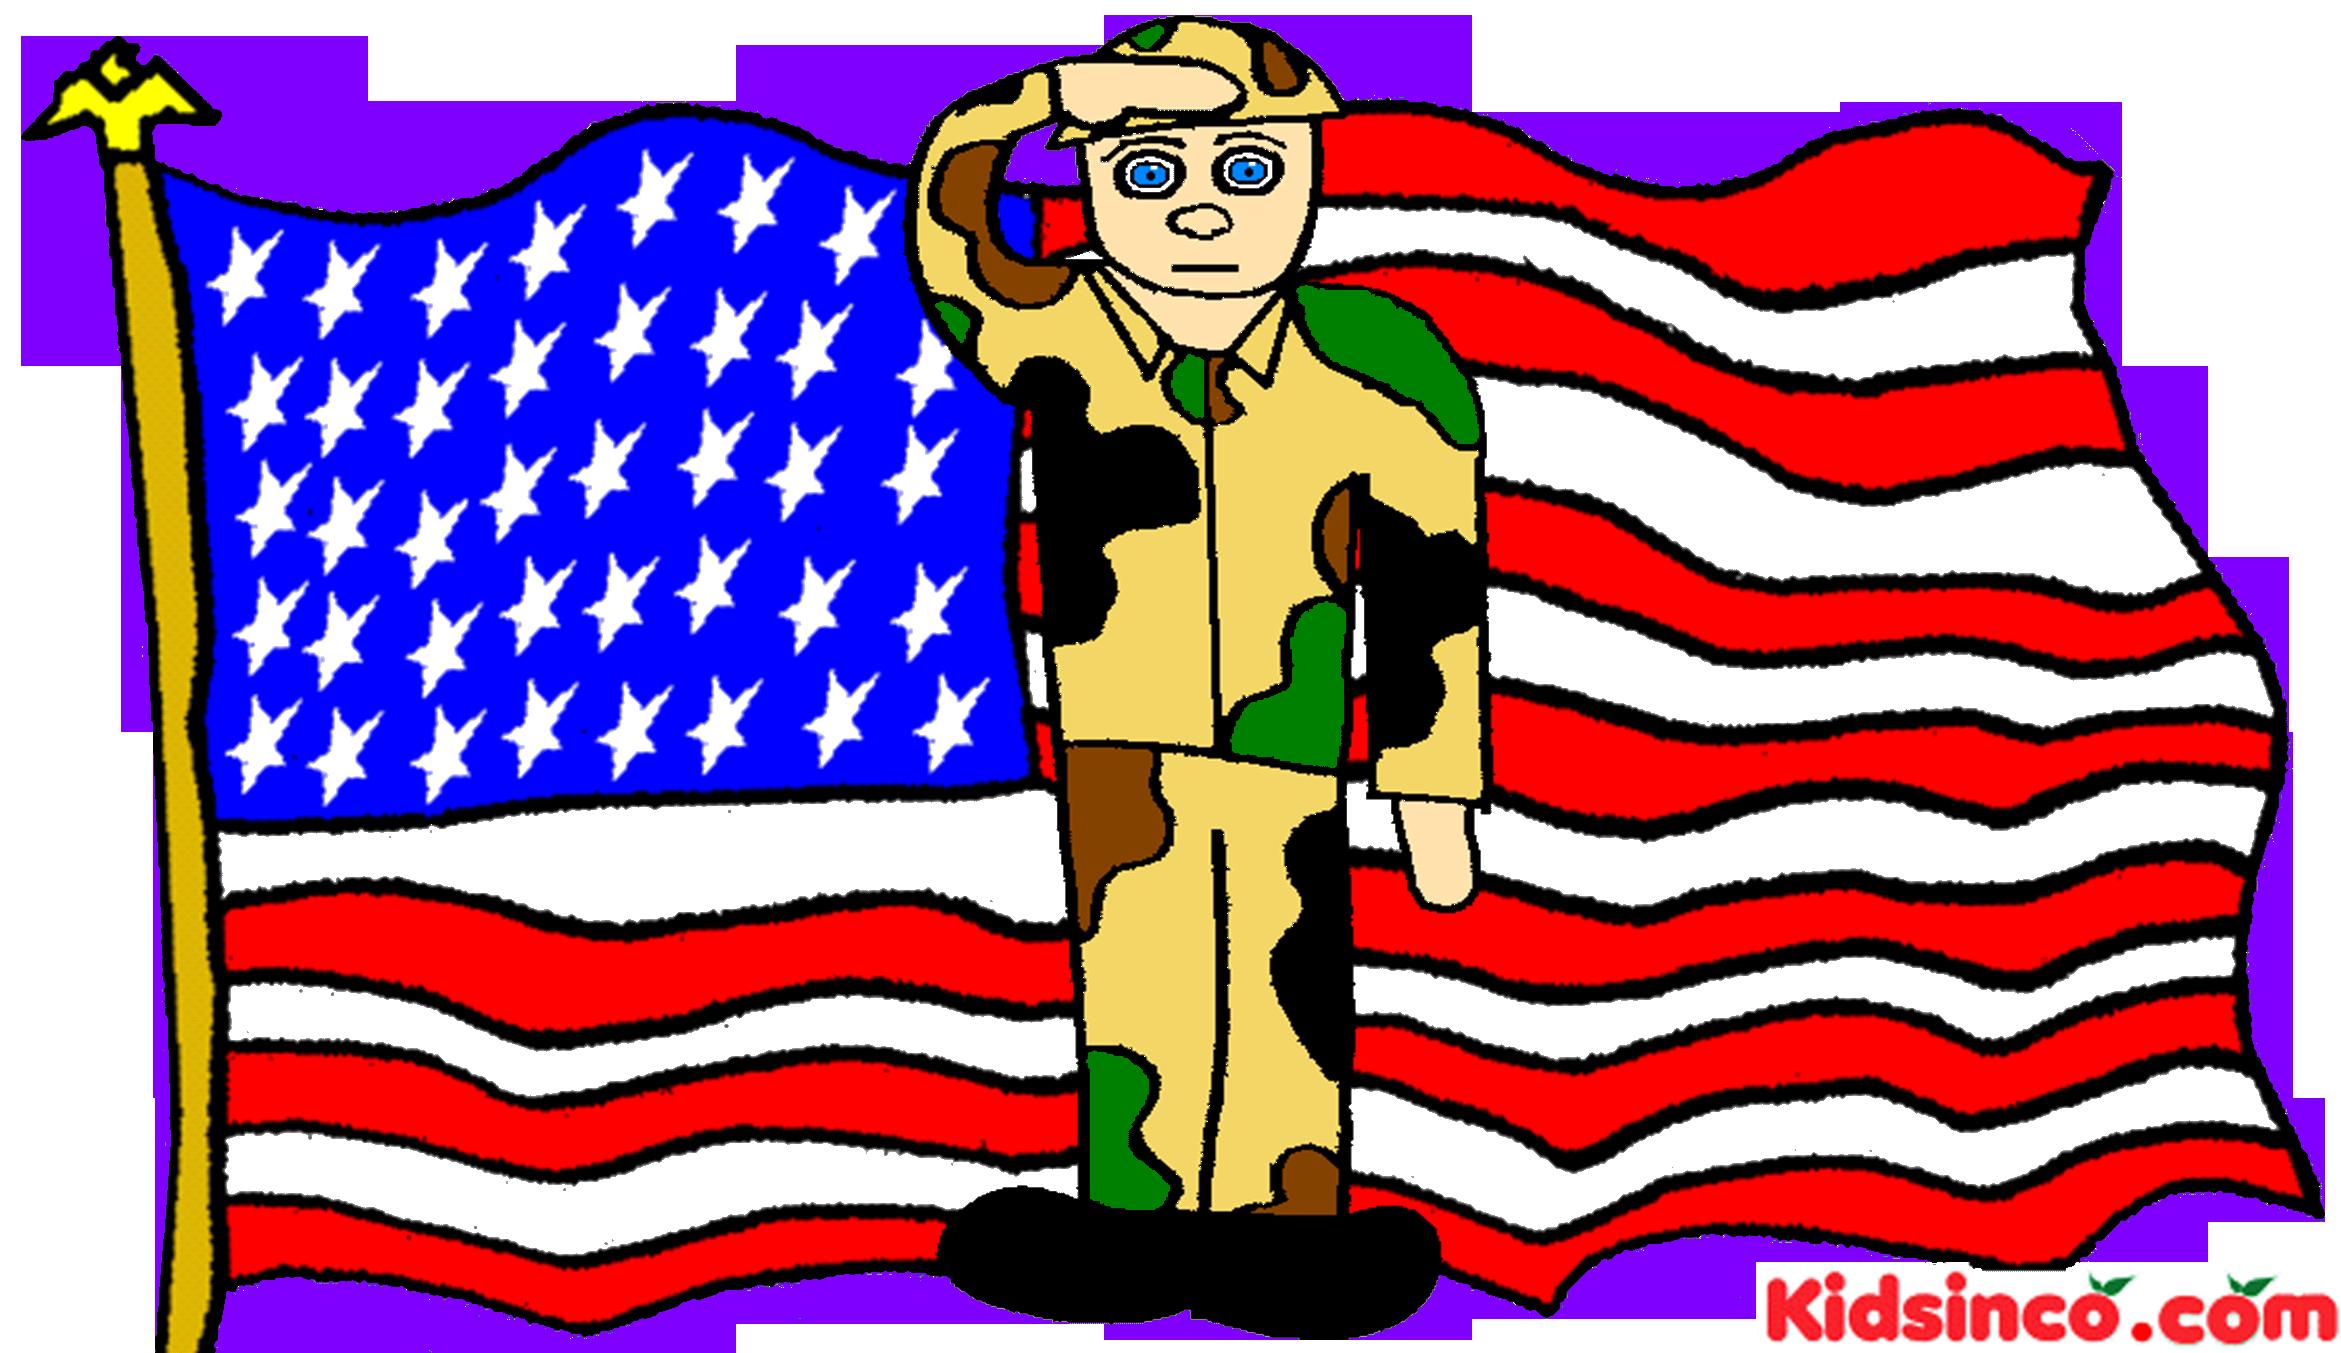 veterans day clipart-veterans day clipart-16